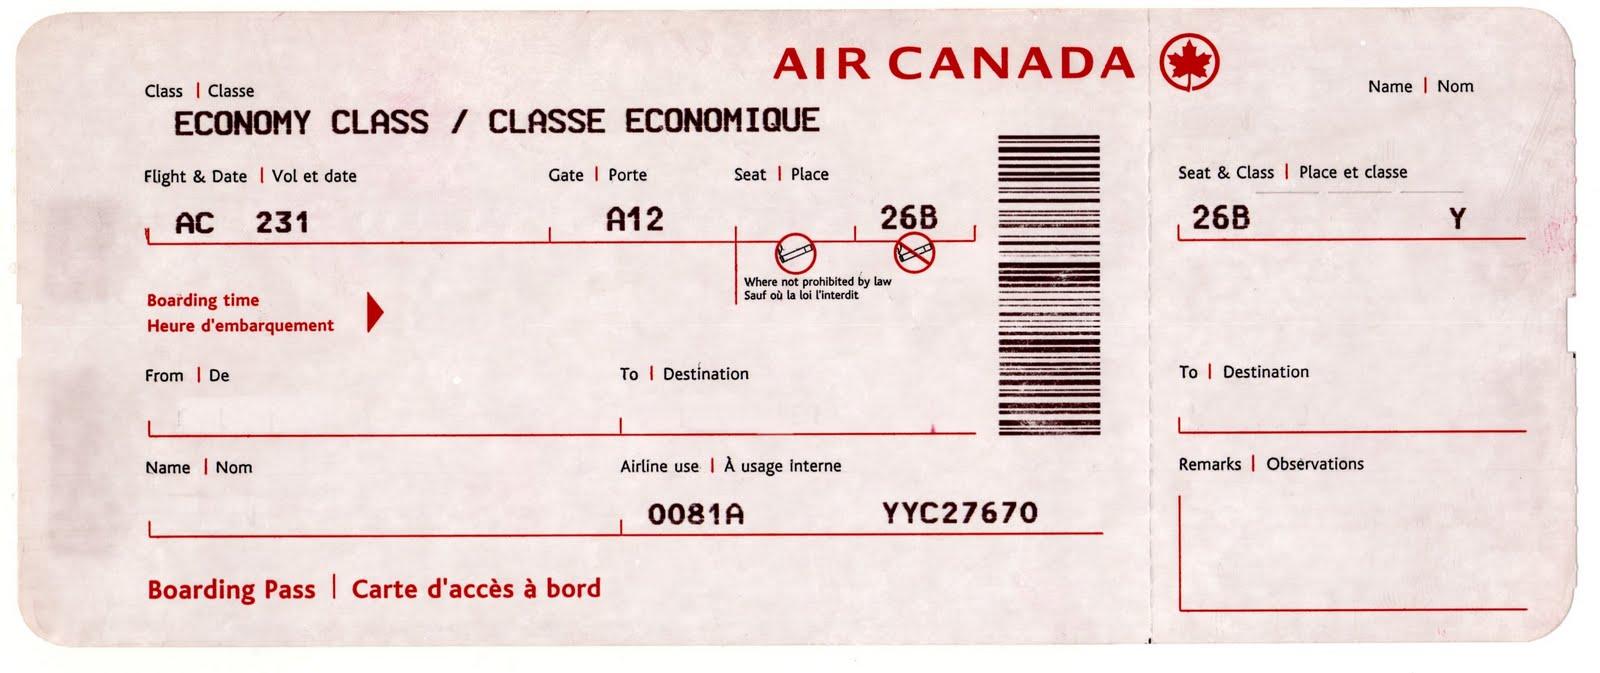 template airline ticket – Template Airline Ticket